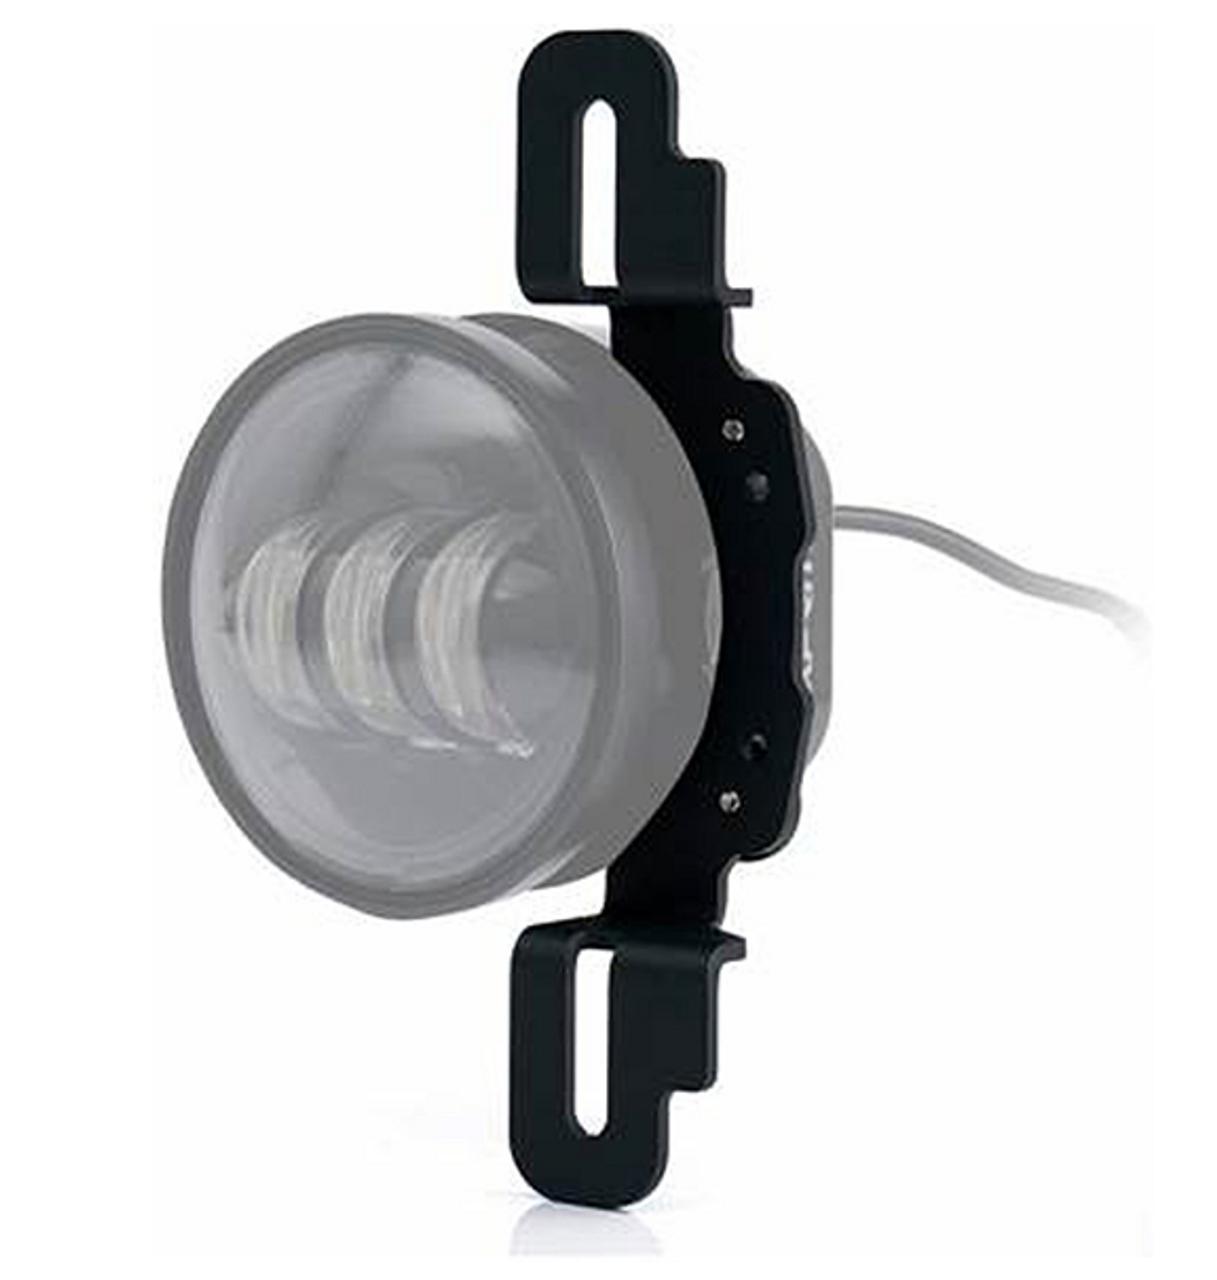 Oracle Lighting 5857-504 Fog Light Adapter Brackets for Jeep Wrangler JK, JL & Gladiator JT with Factory Steel Bumpers 2013+